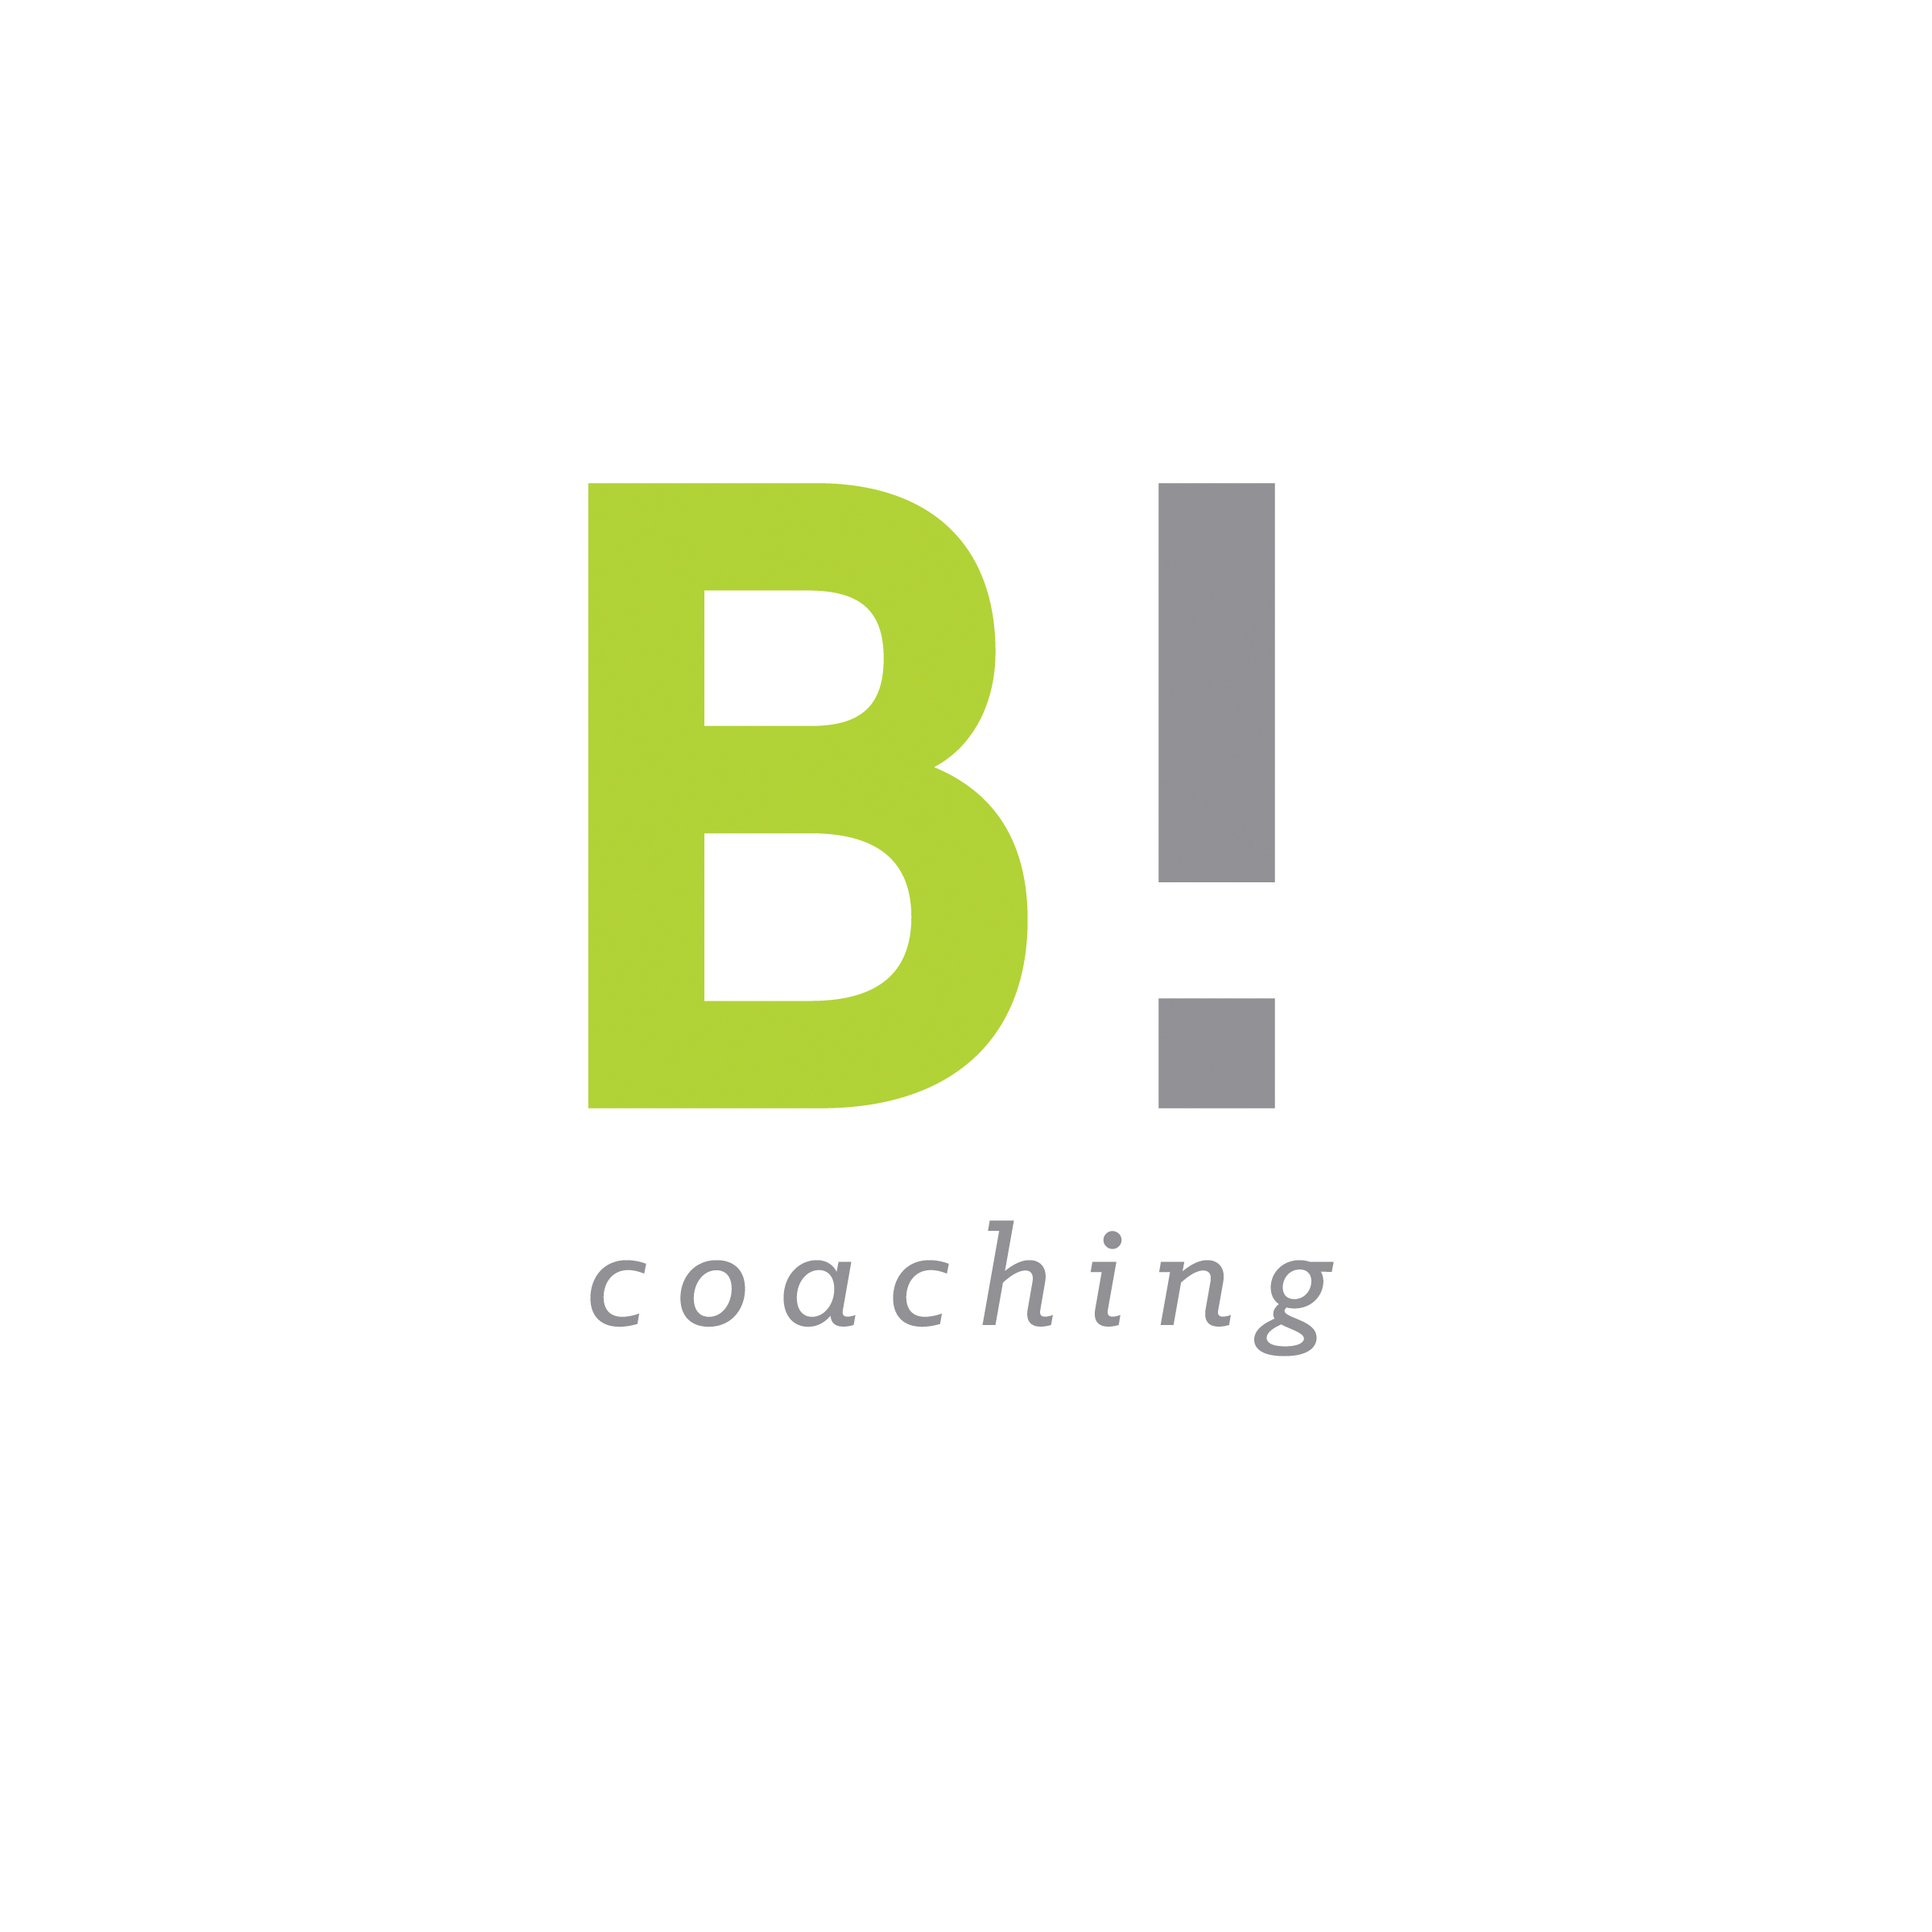 BF insta BF coaching 01.jpg